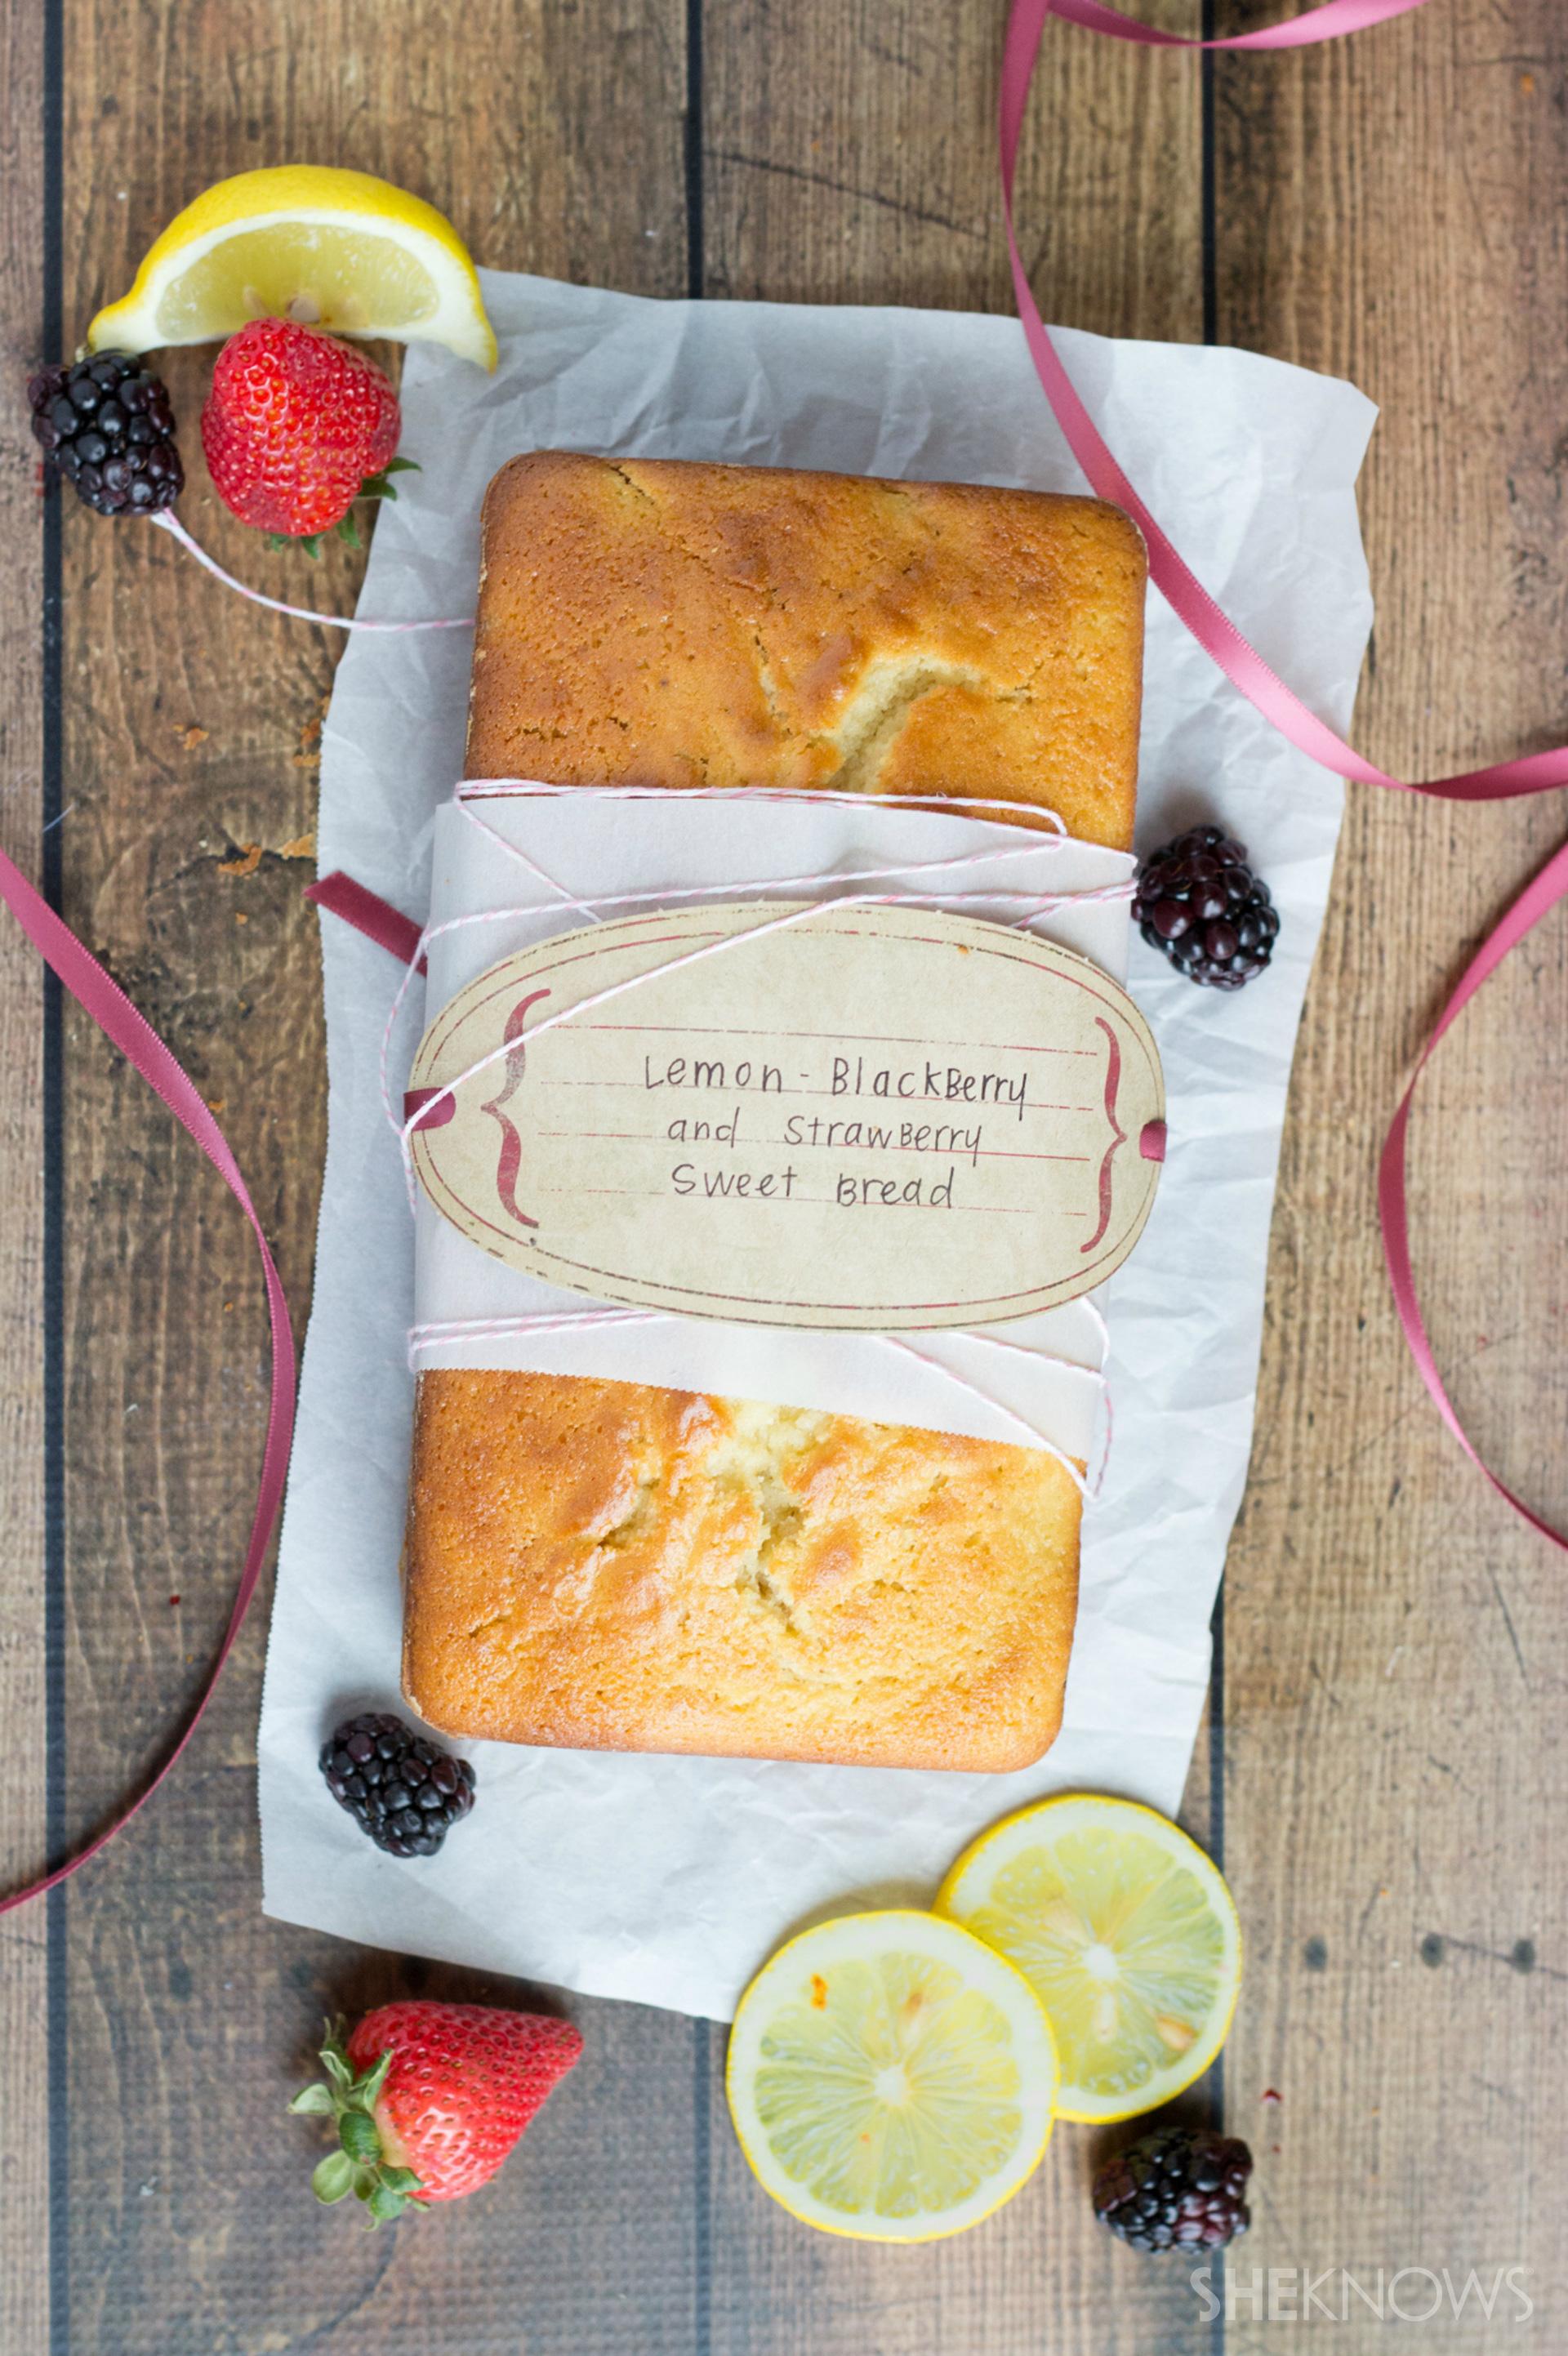 Lemon-Blackberry and Strawberry Sweet Bread